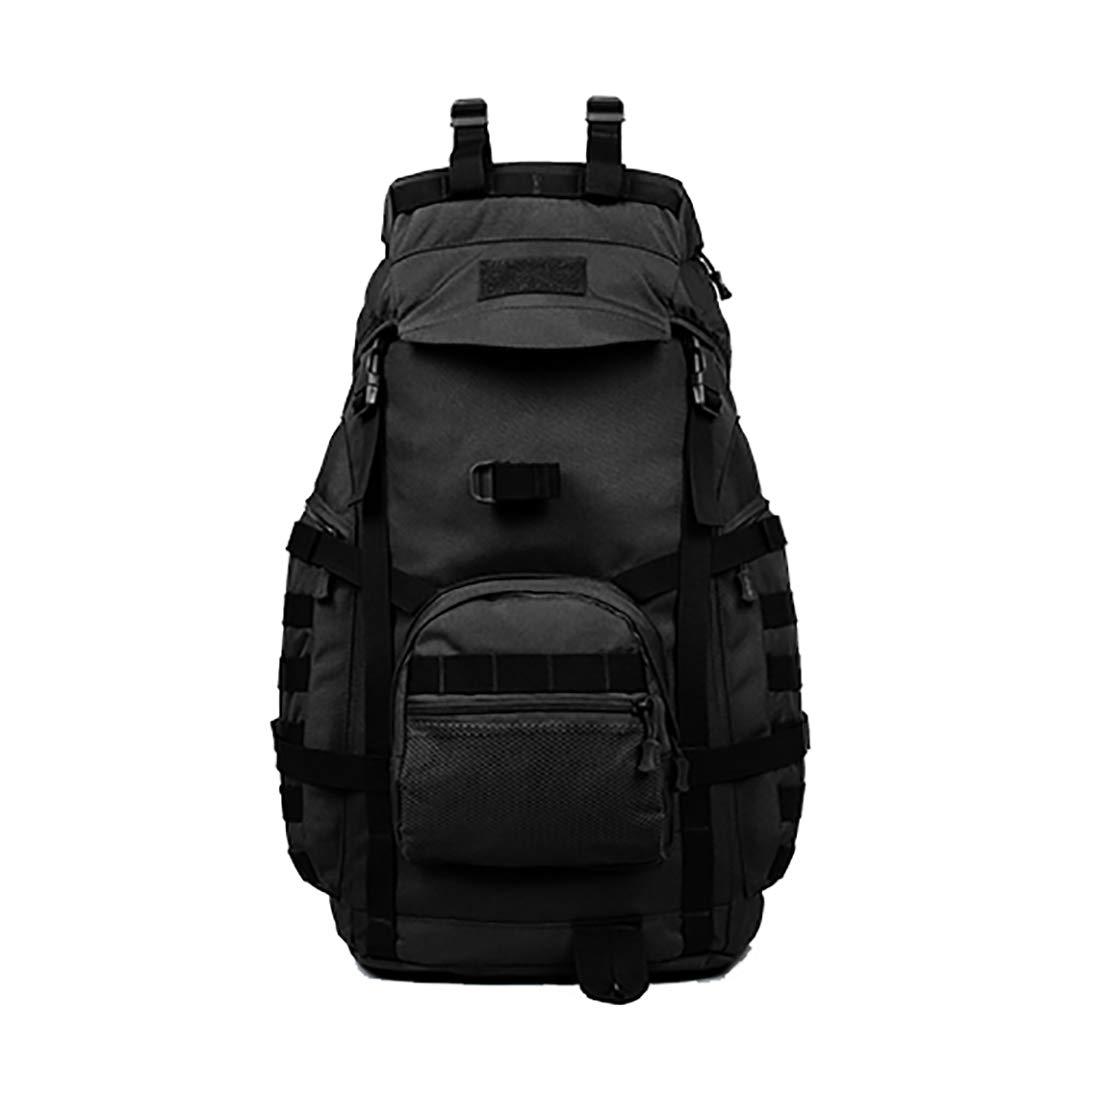 CAFUTY 男性と女性のための等身大のキャンプハイキングランニング登山バッグのバックパック (Color : ブラック)  ブラック B07N6H83SJ